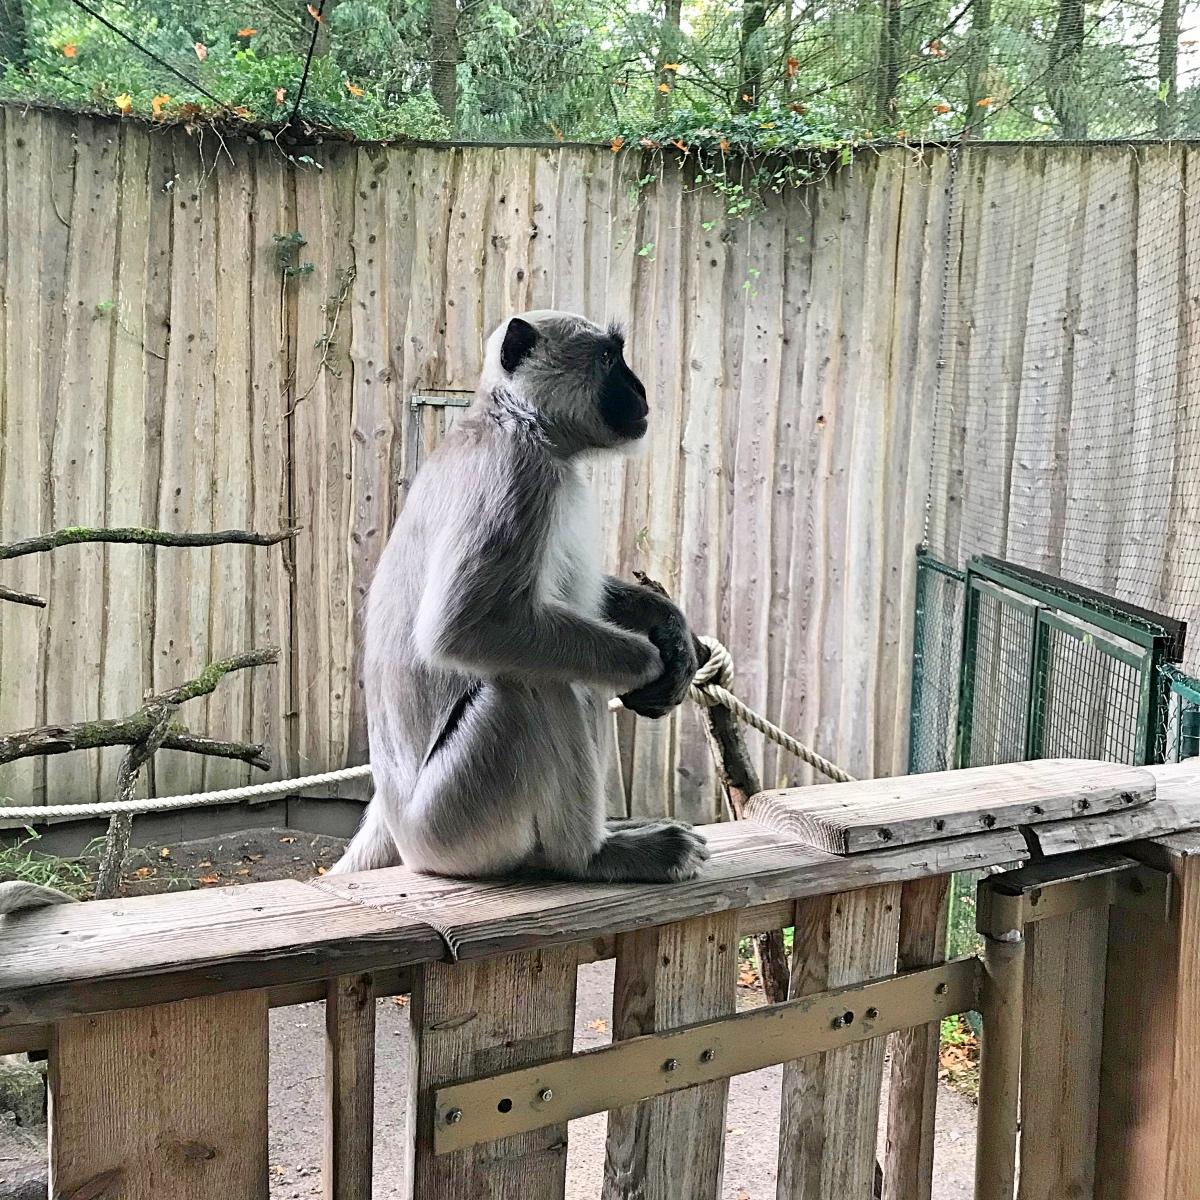 Loslopende apen in de Apenheul